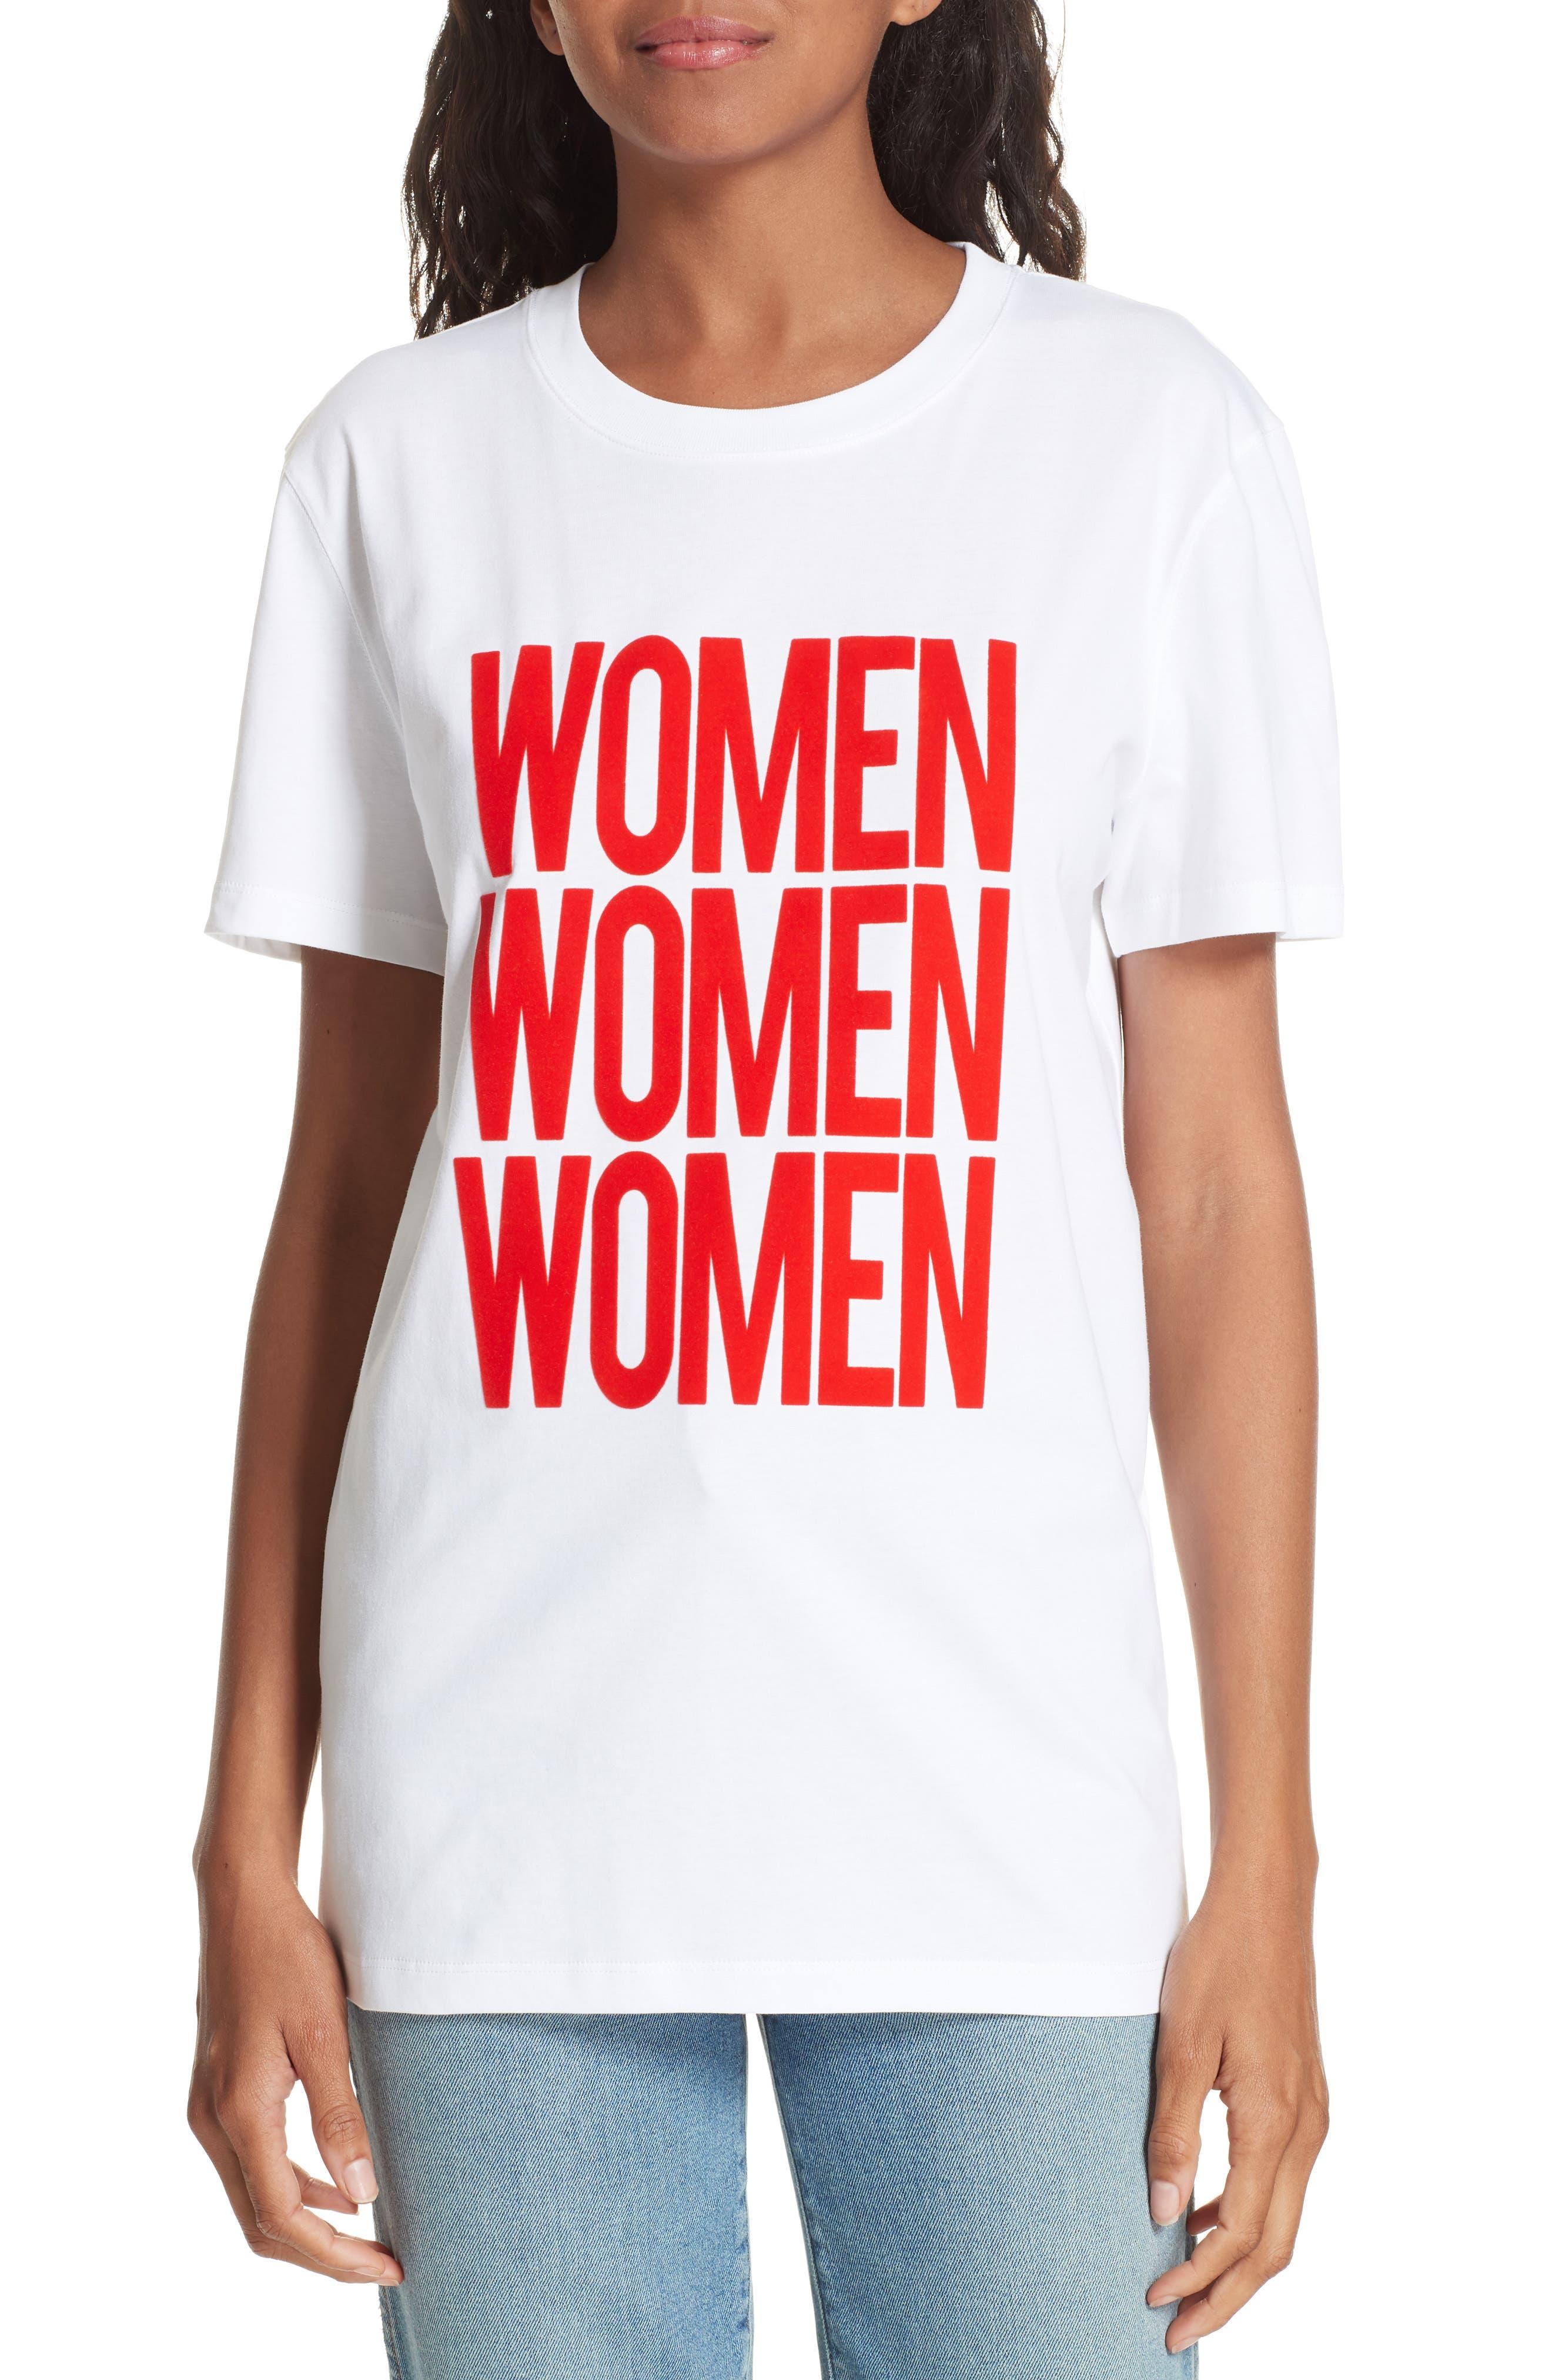 Ciel Women Women Women Tee,                         Main,                         color, WHITE